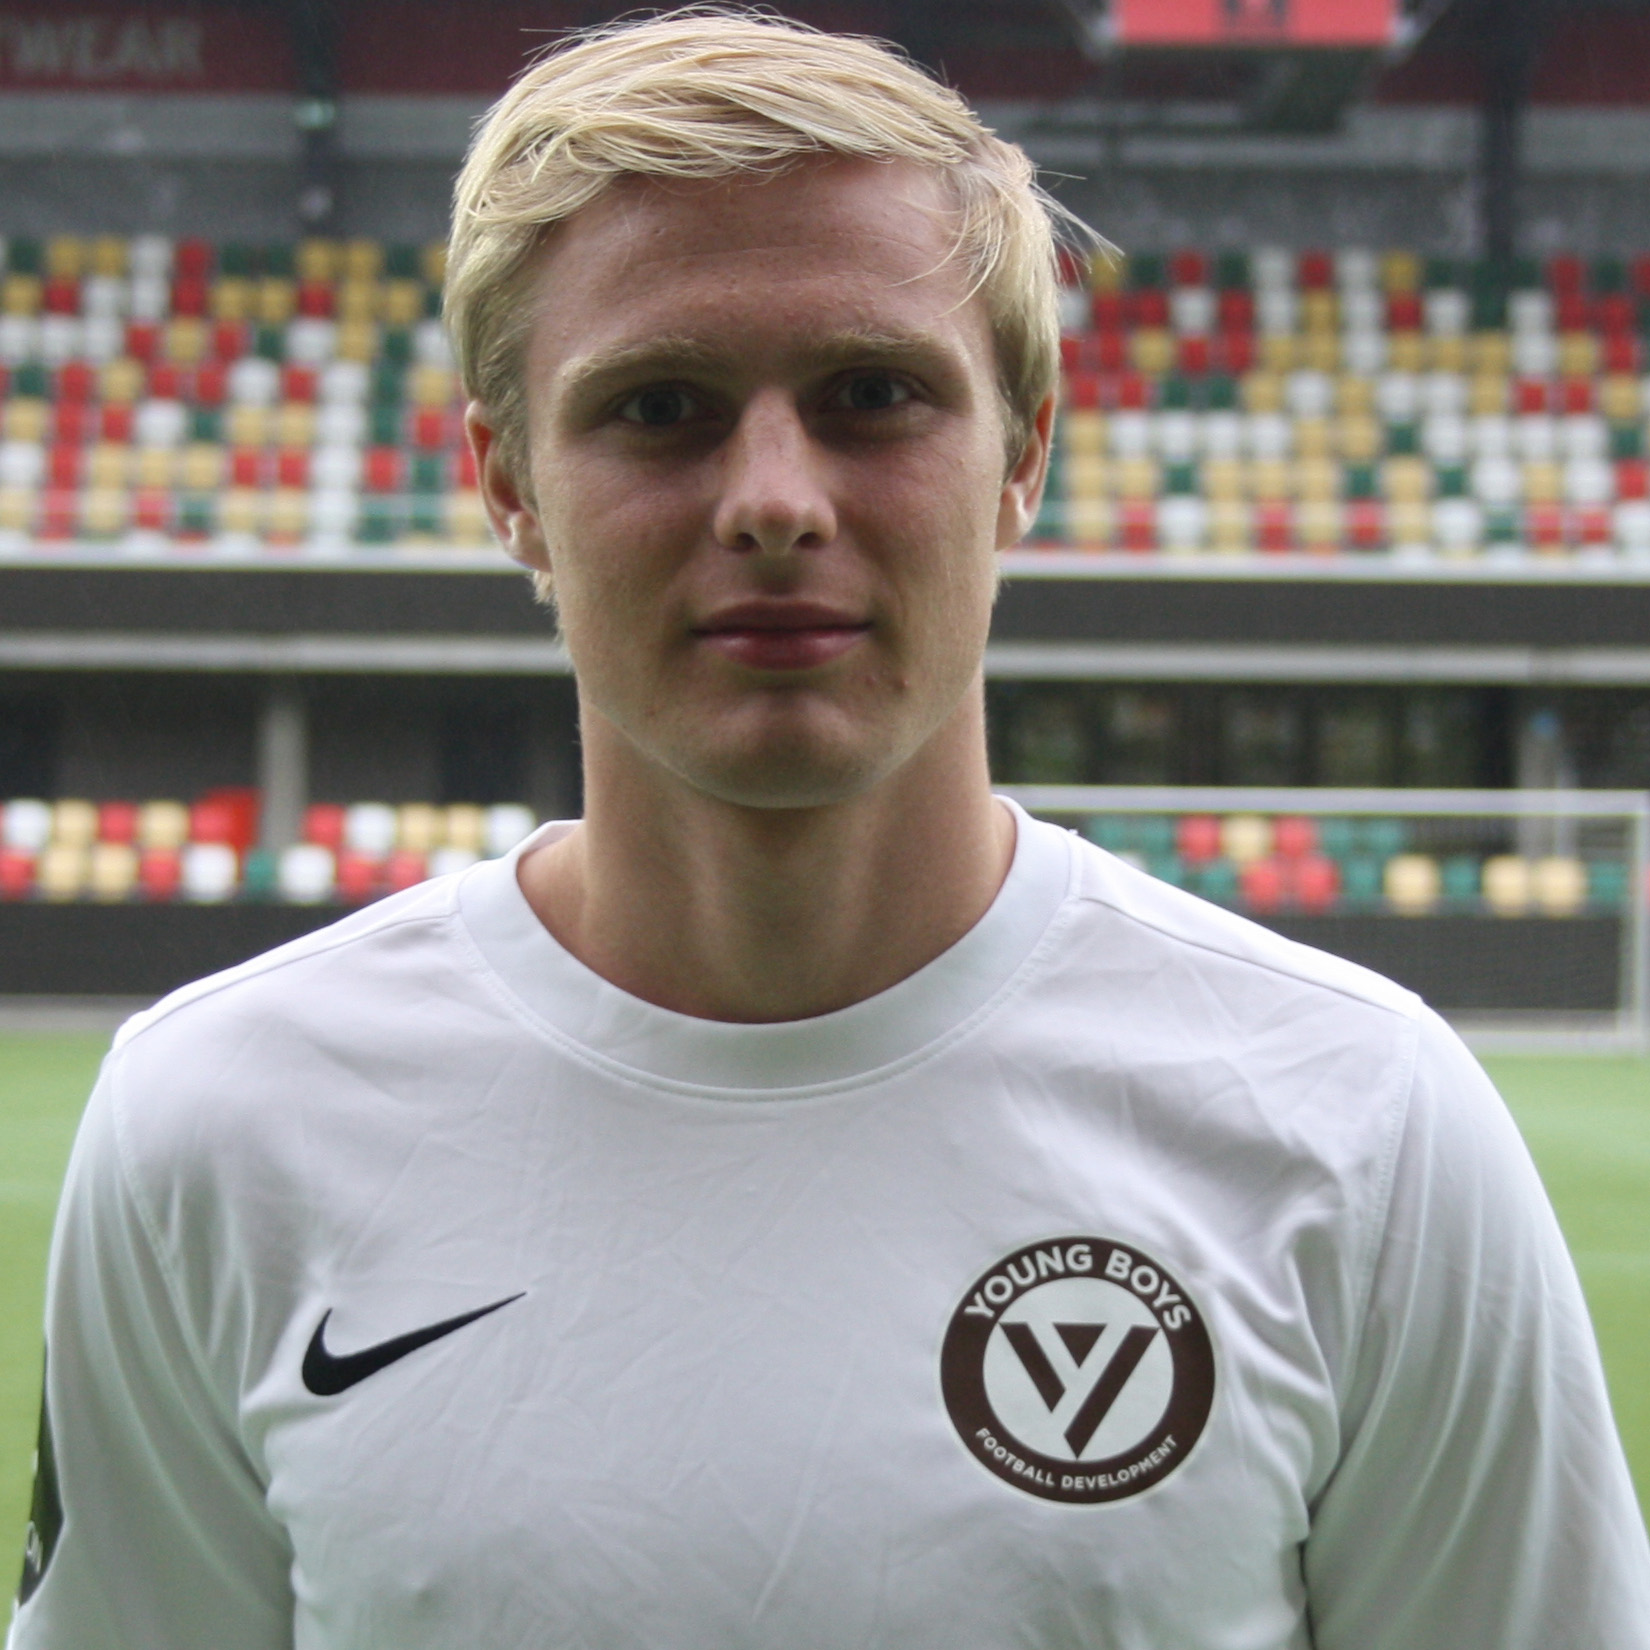 Joakim Grosen